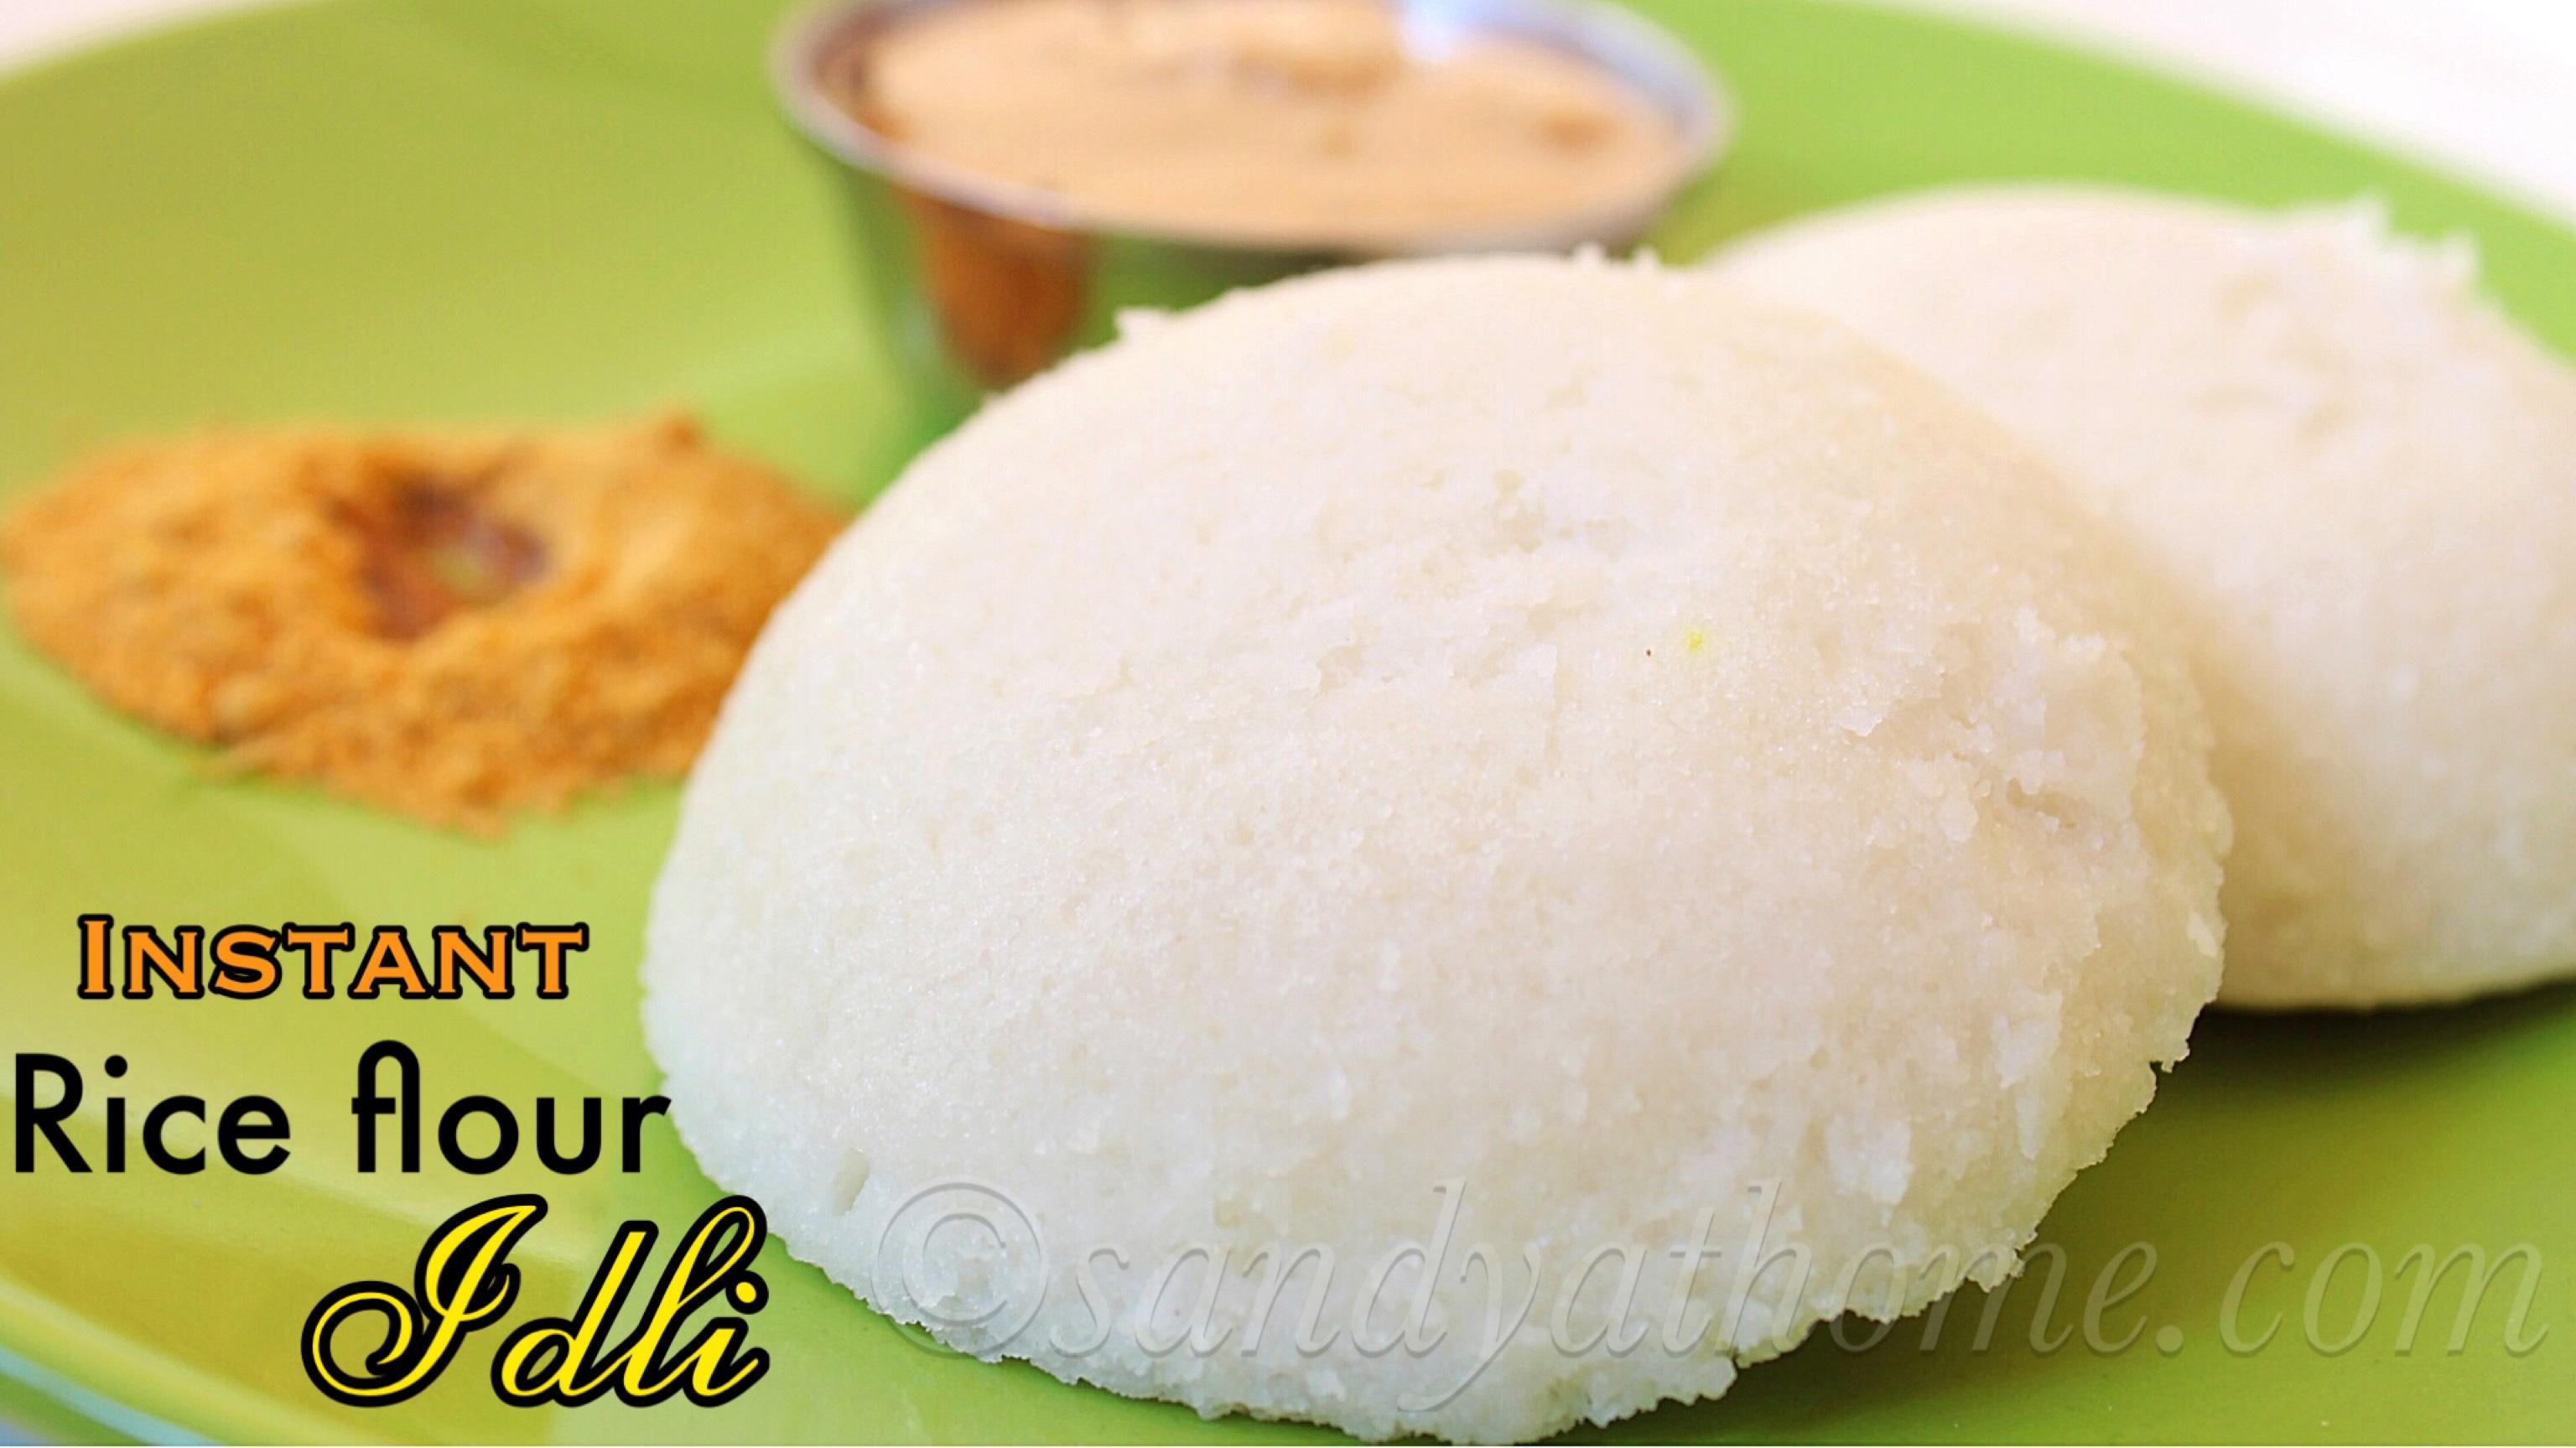 Rice flour idli recipe, Instant idli recipe | Sandhya's recipes